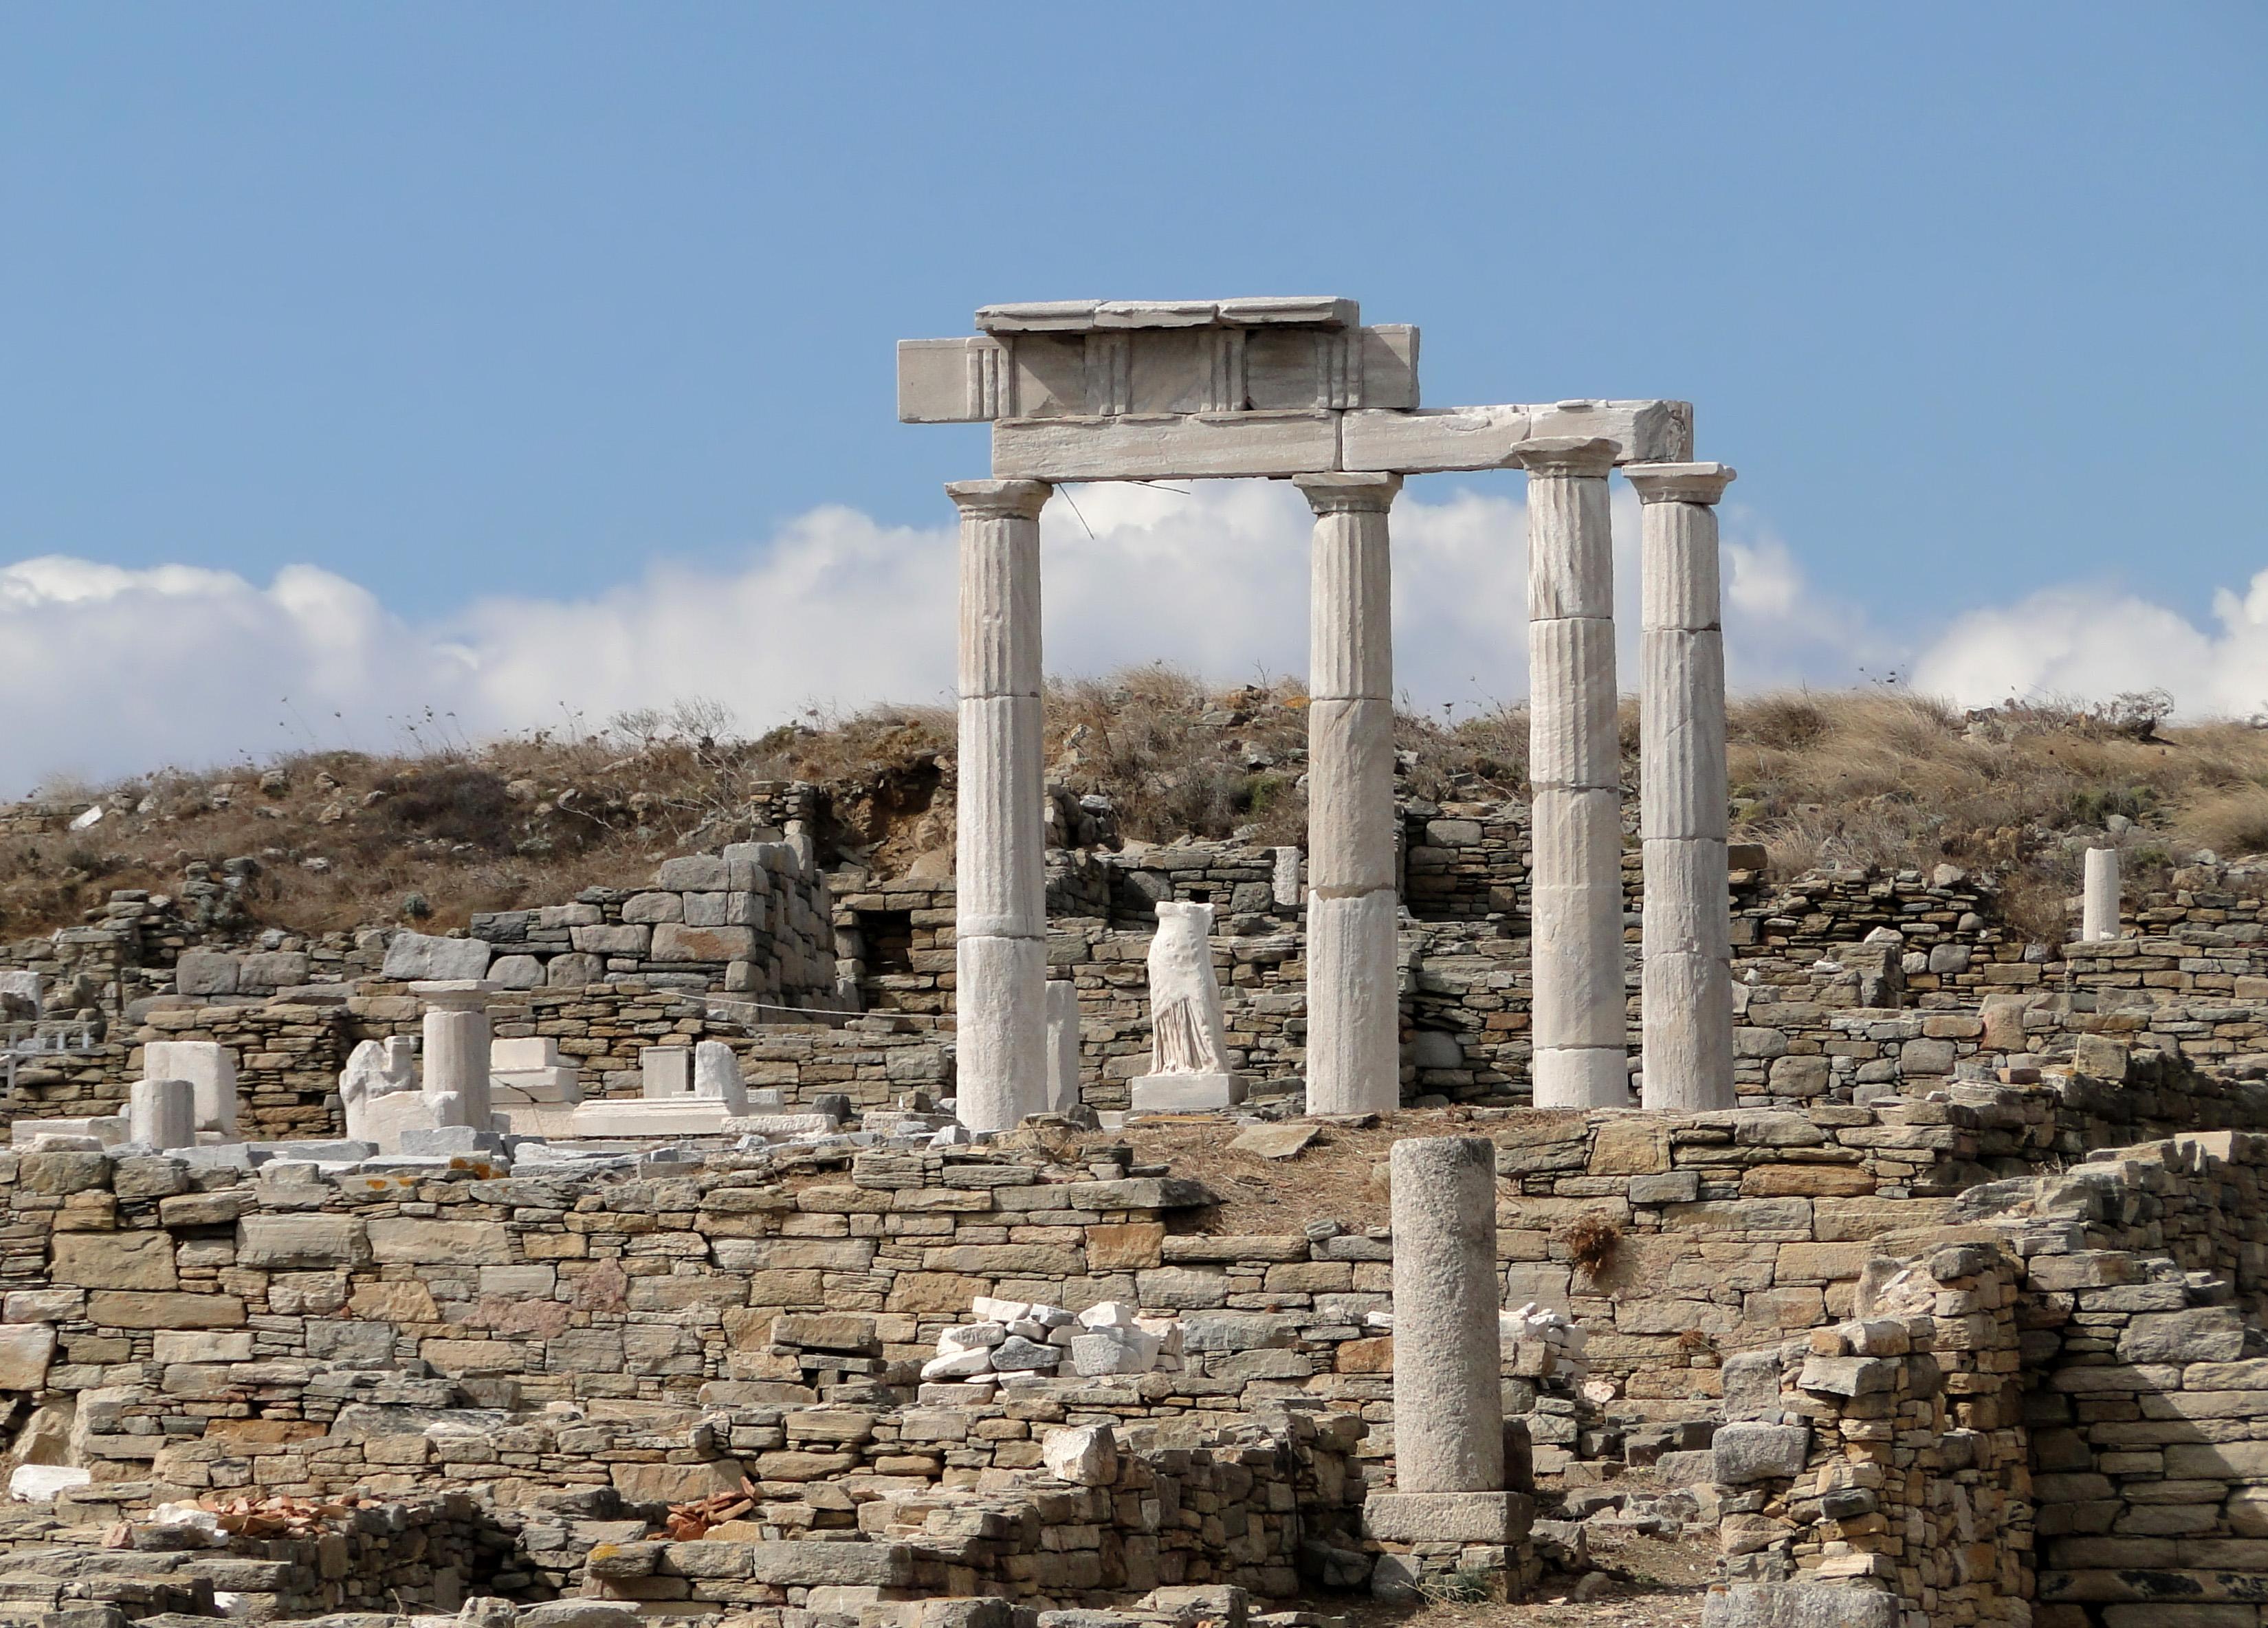 File:Establishment of the Poseidoniasts, Delos 02.jpg ...